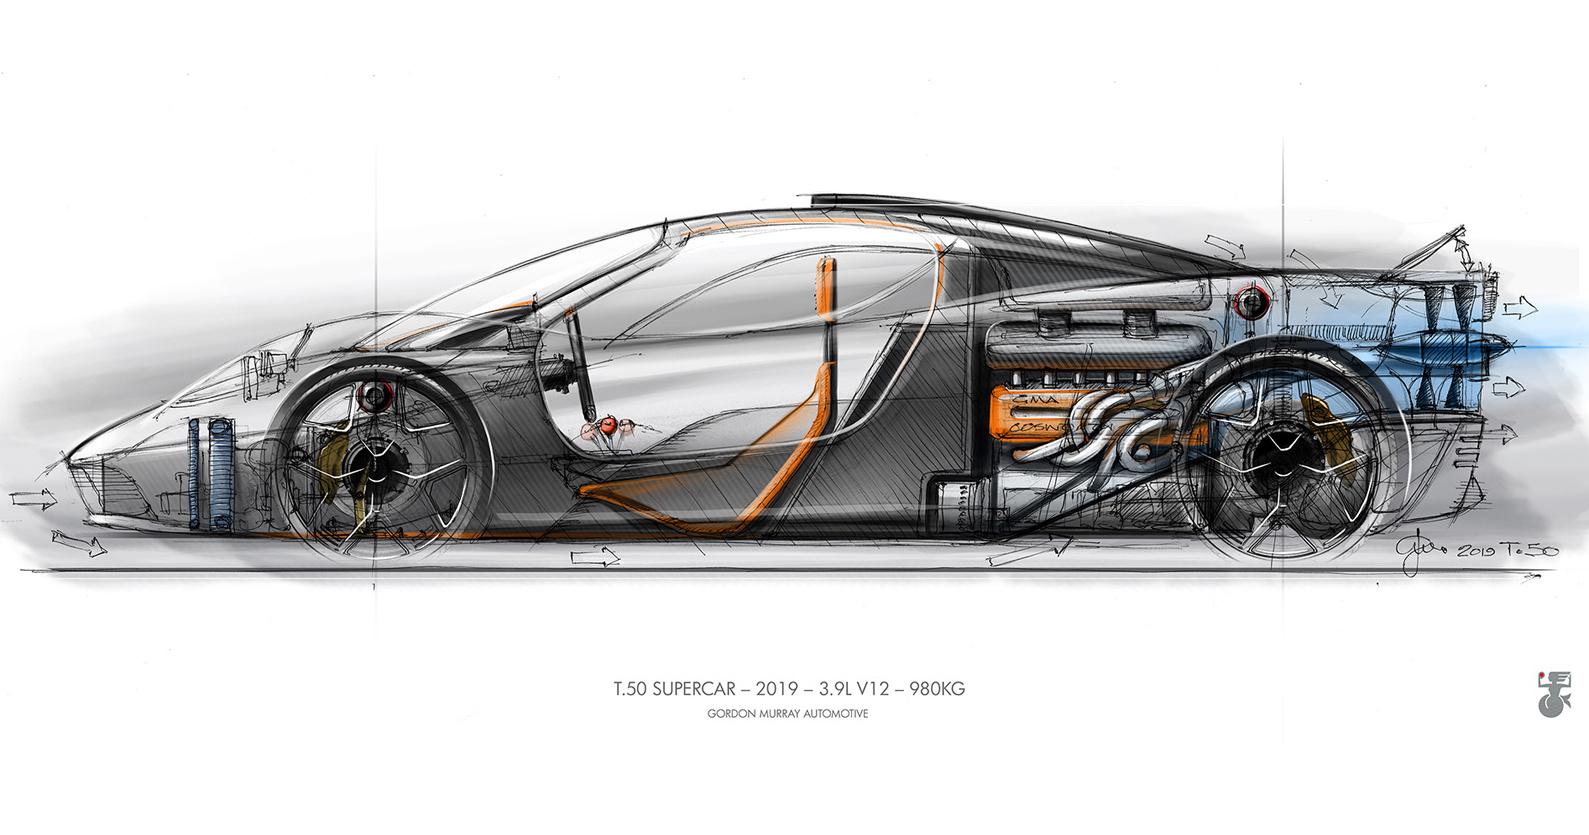 Gordon Murray Automotive - T.50